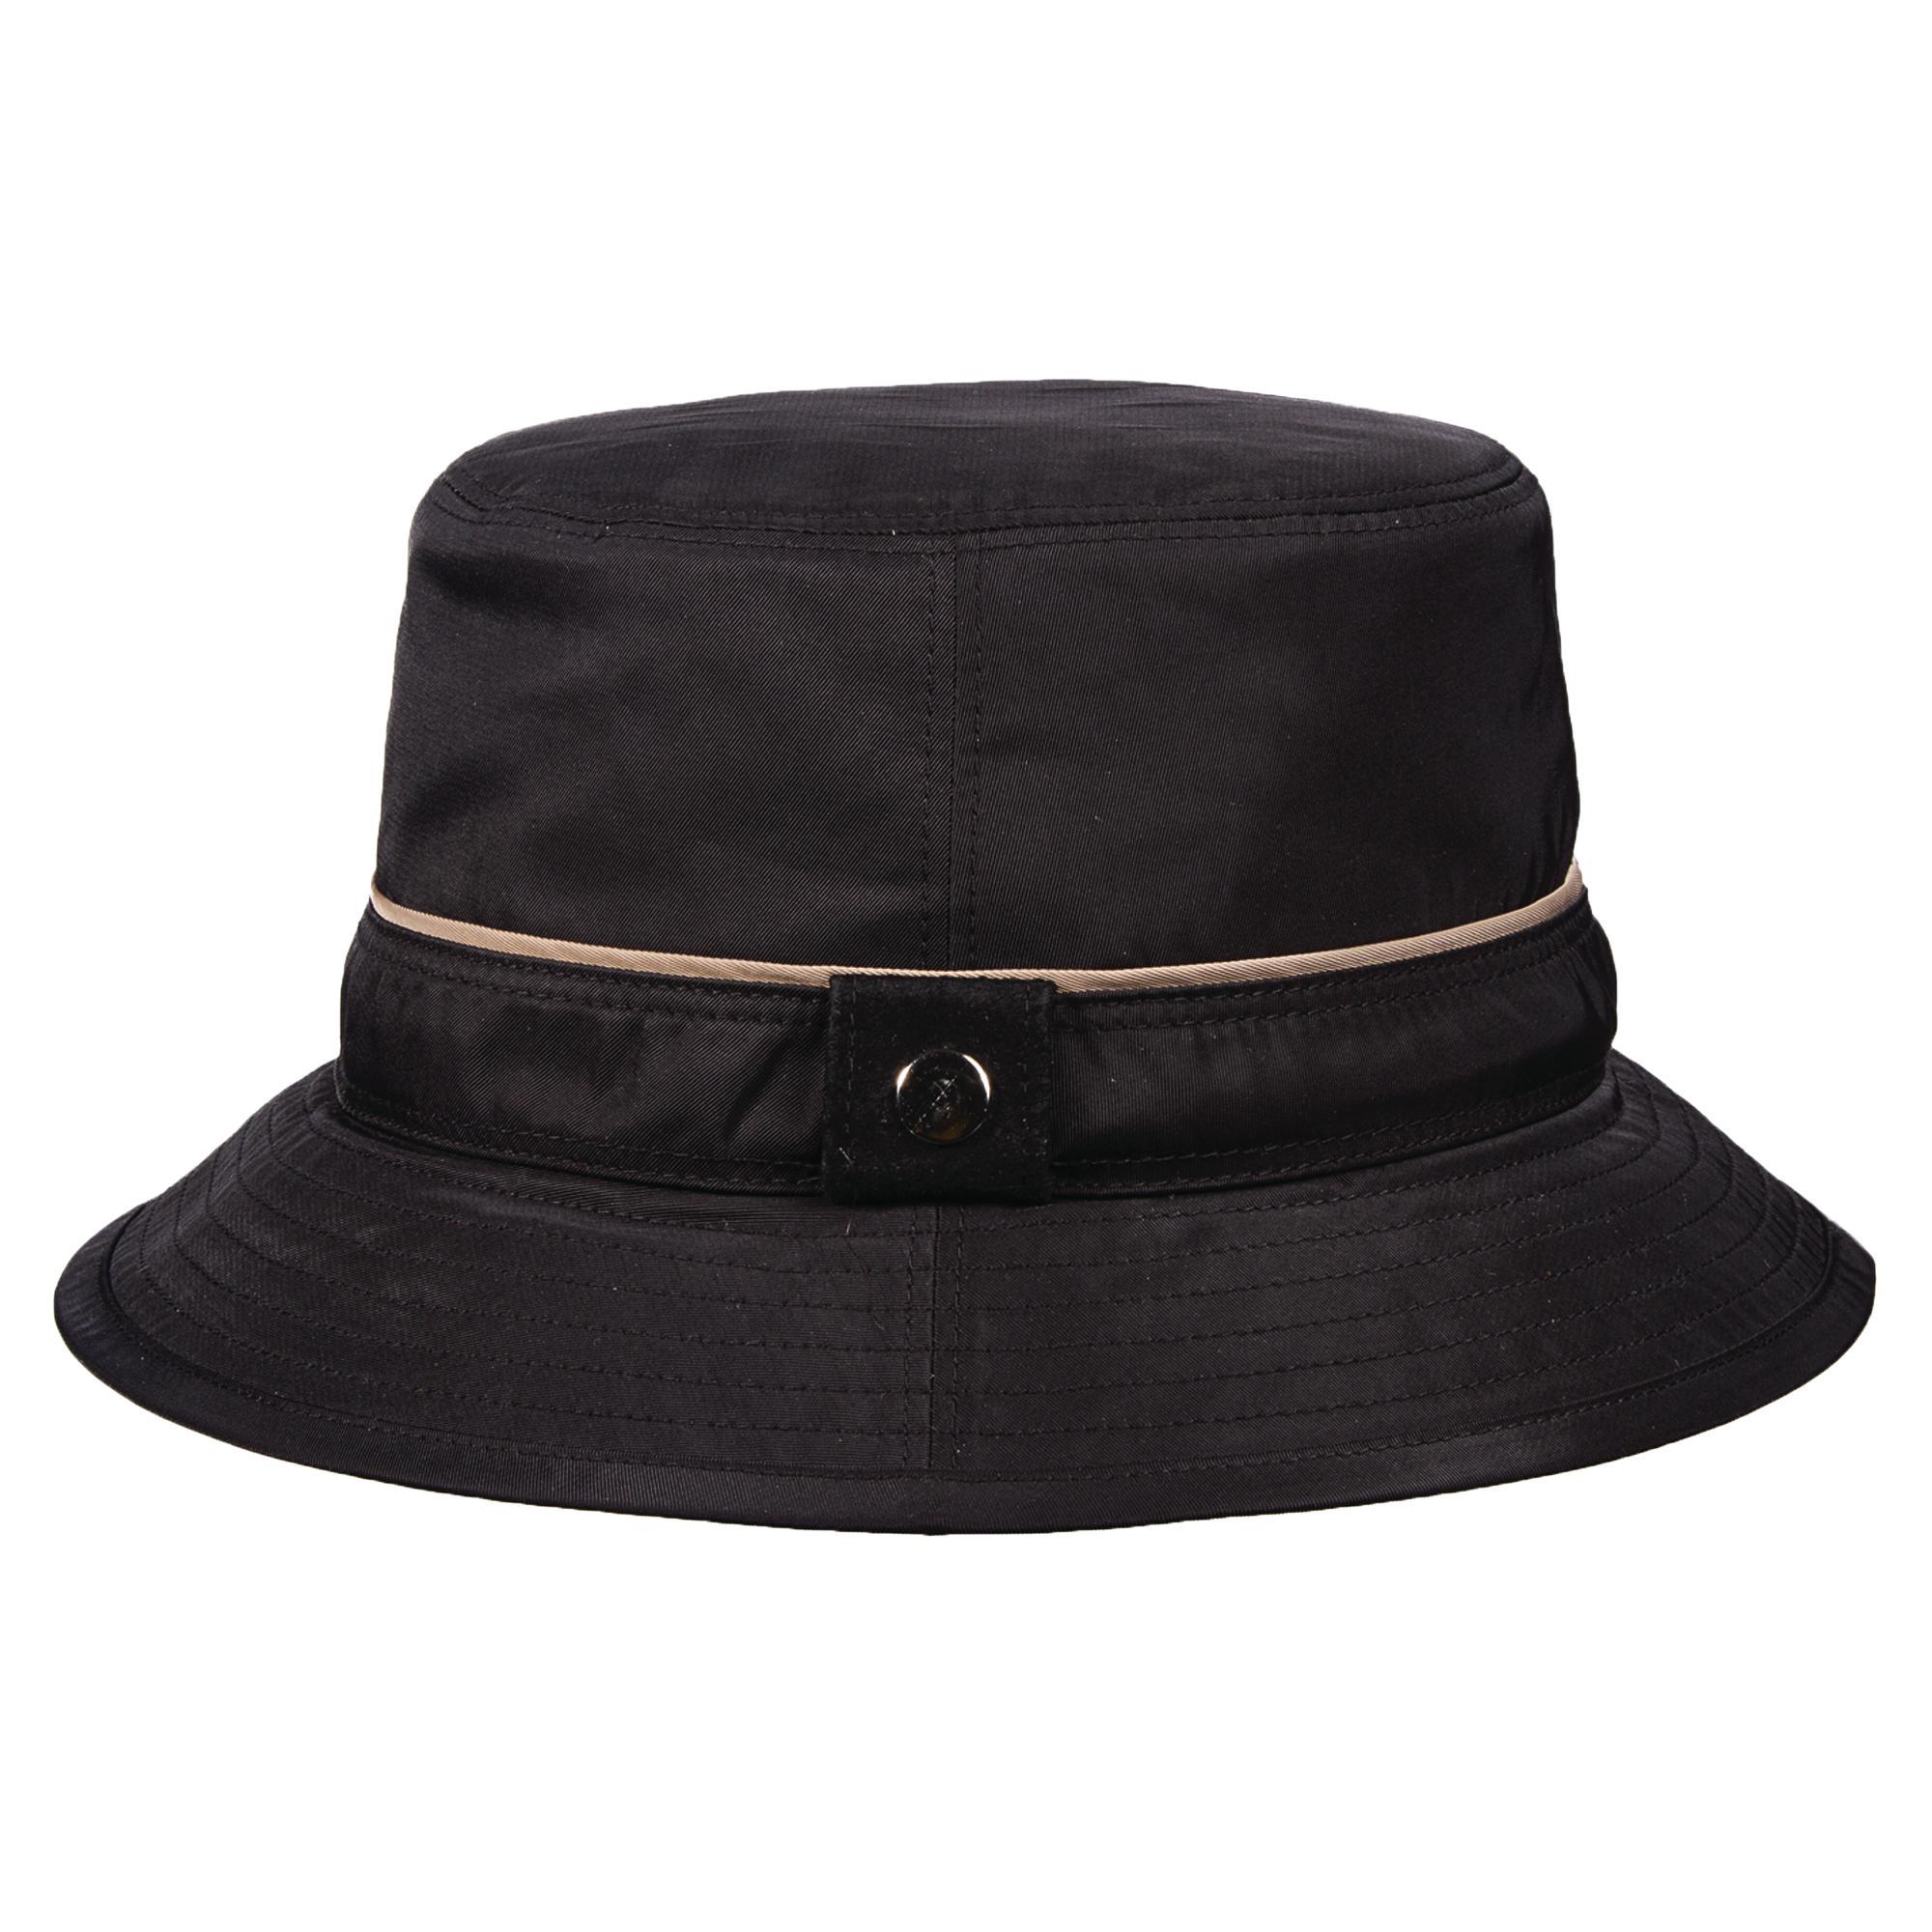 New Stetson Women's Waterproof Rain and Snow Bucket Hat   eBay